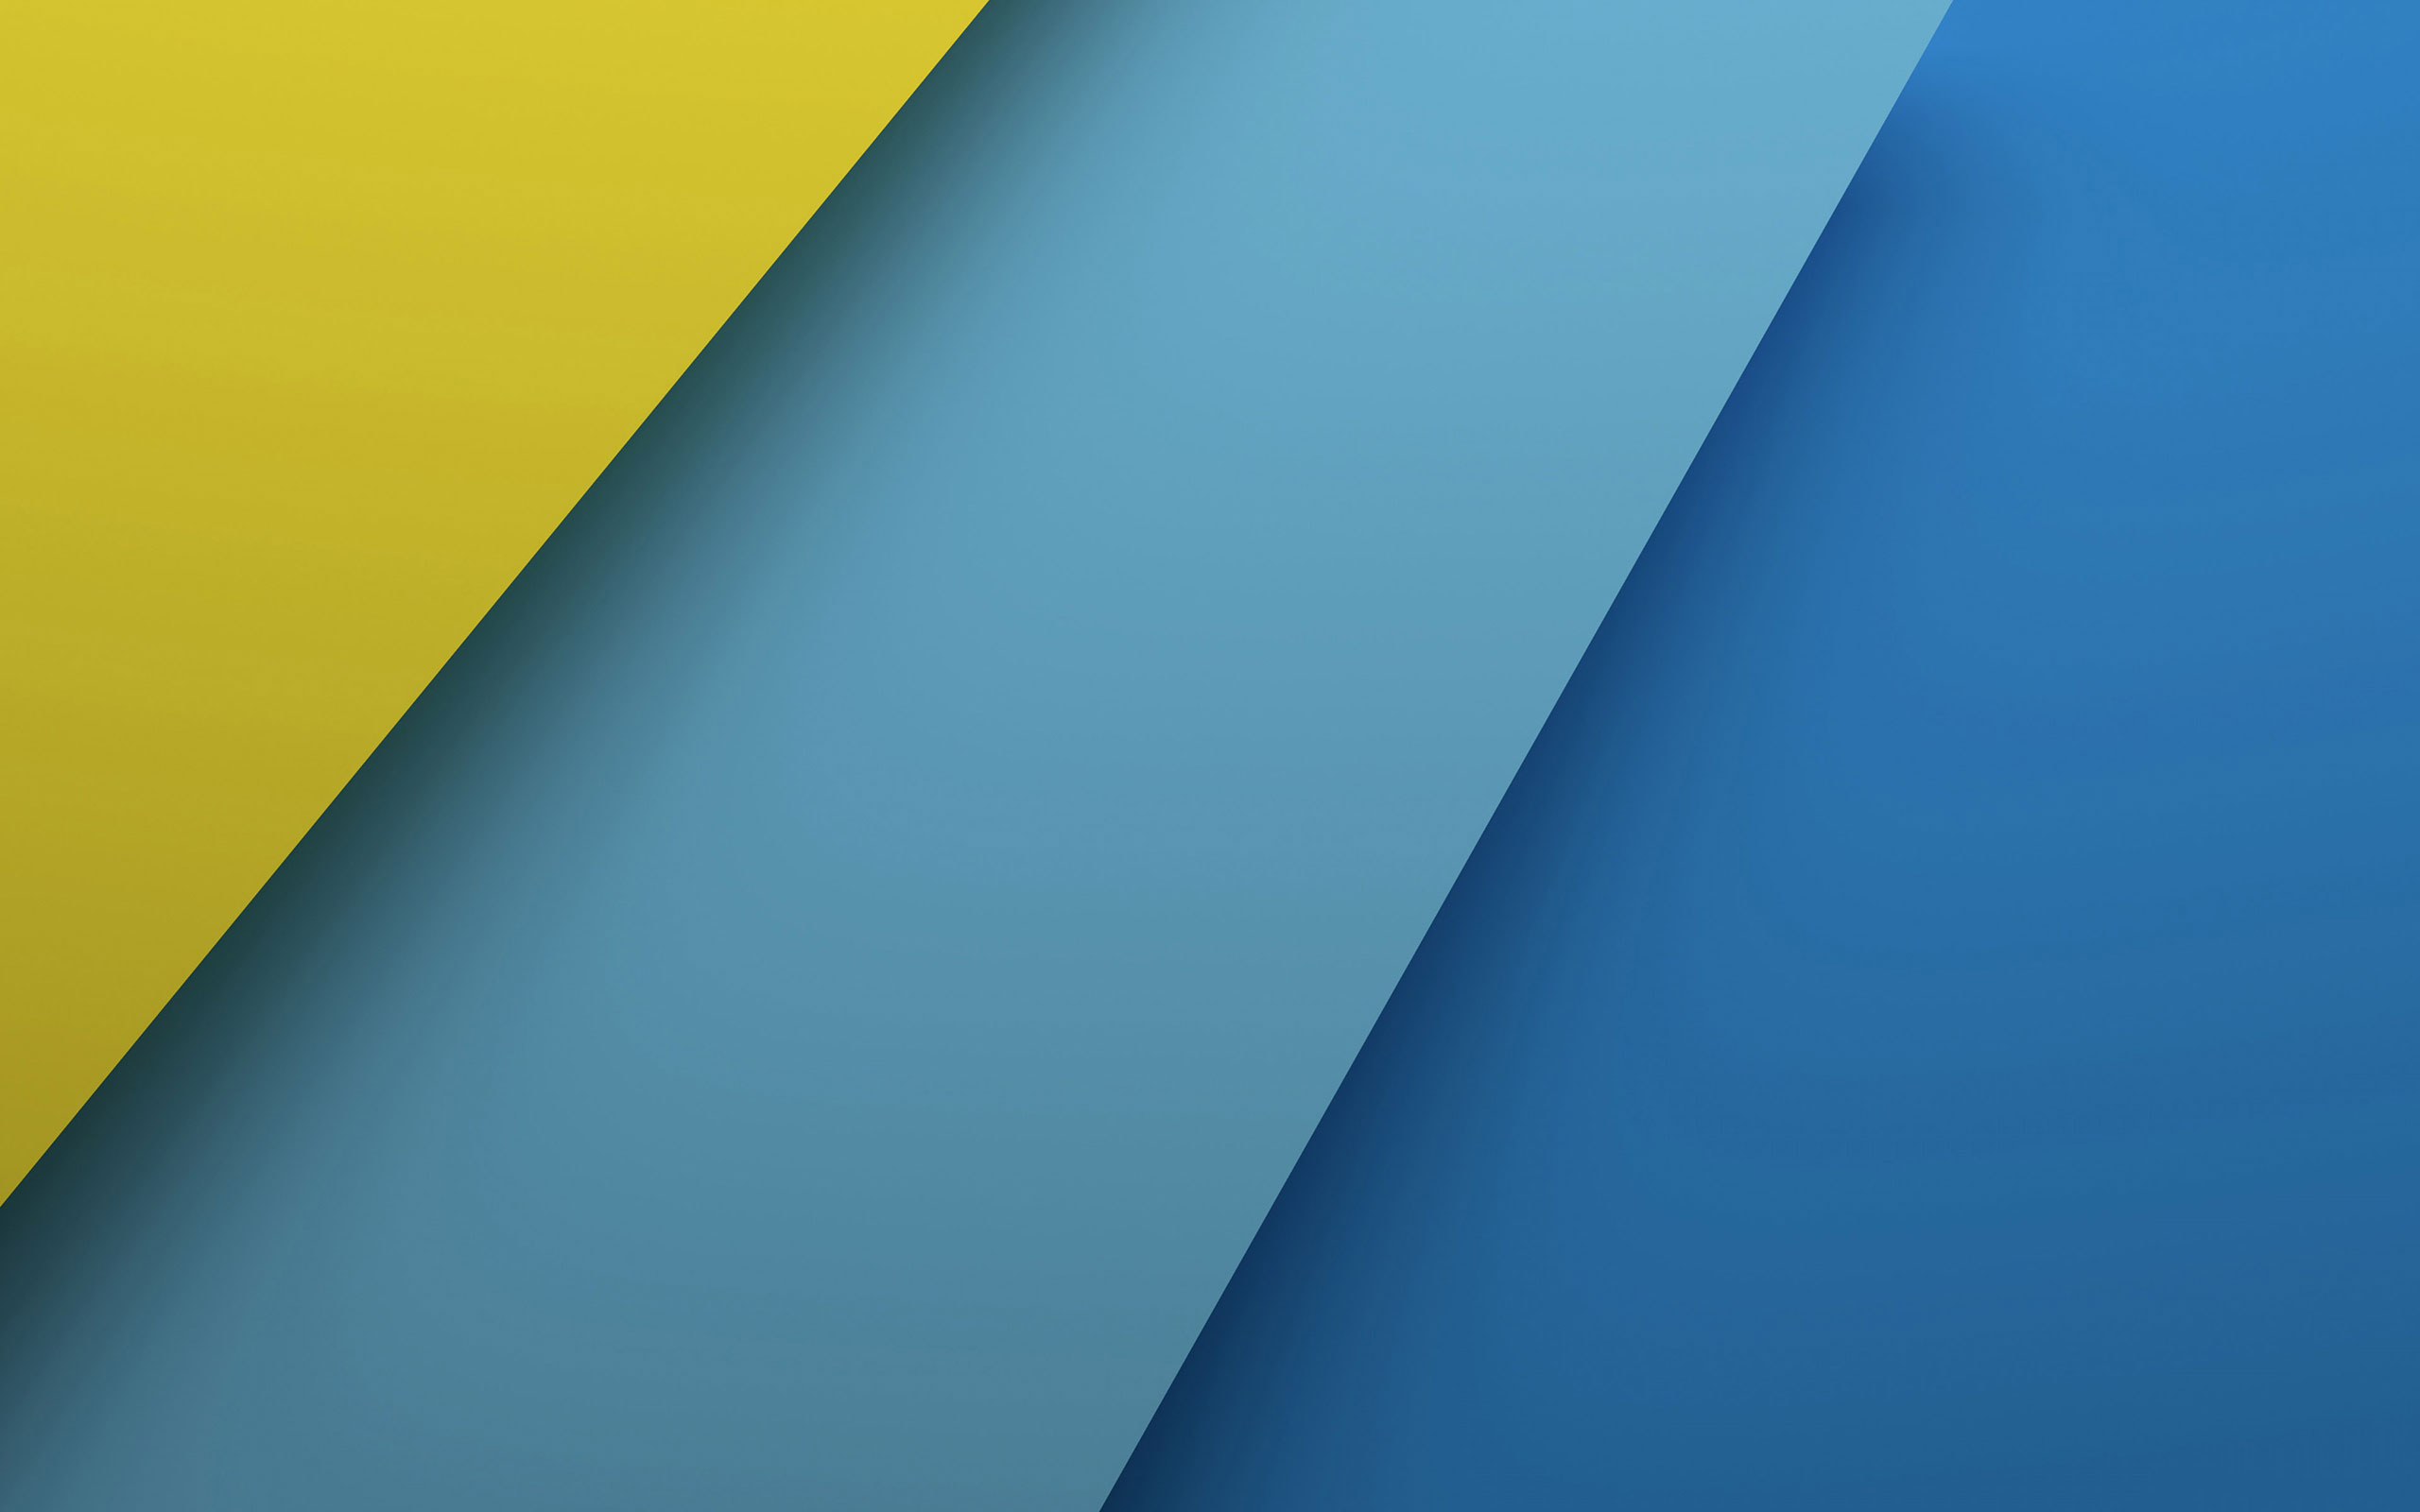 Free Download Google Material Design Wallpapers 2560x1600